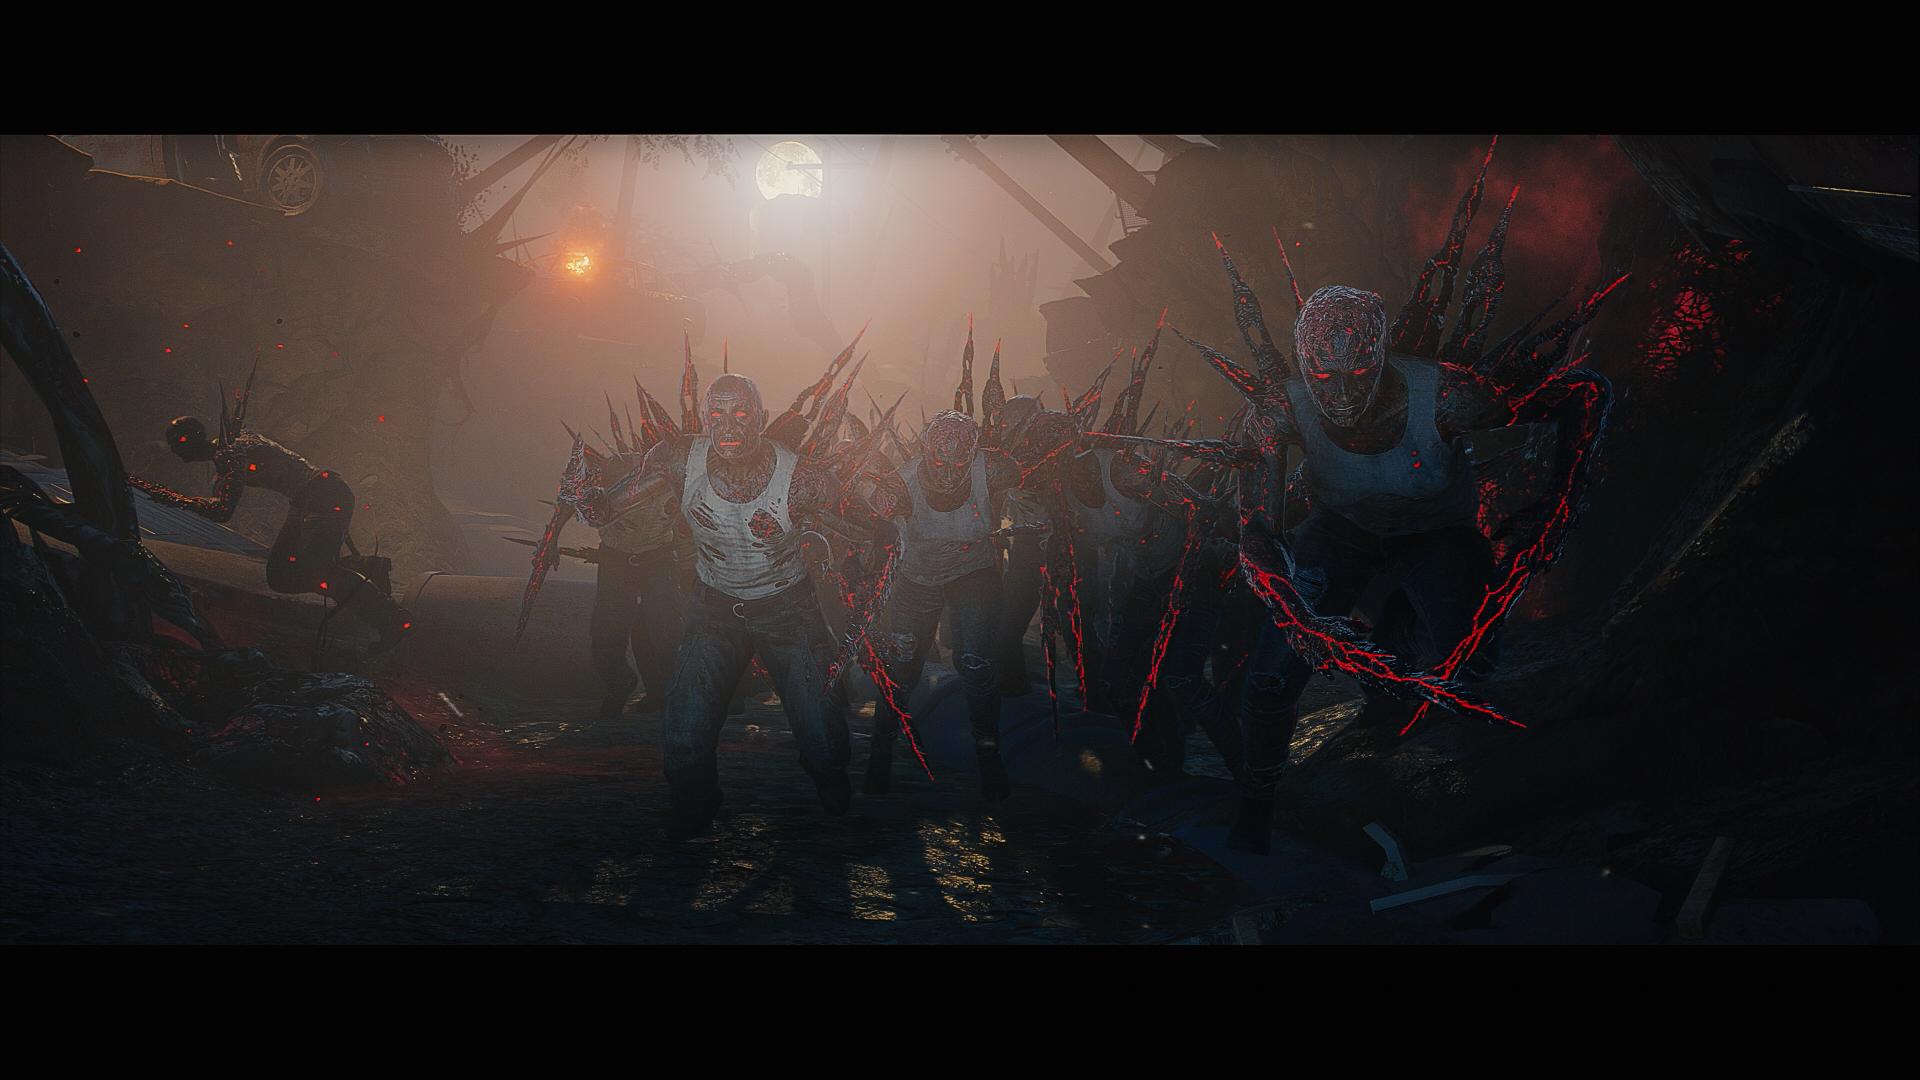 Rainbow Six Siege meets Left 4 Dead in new Outbreak mode